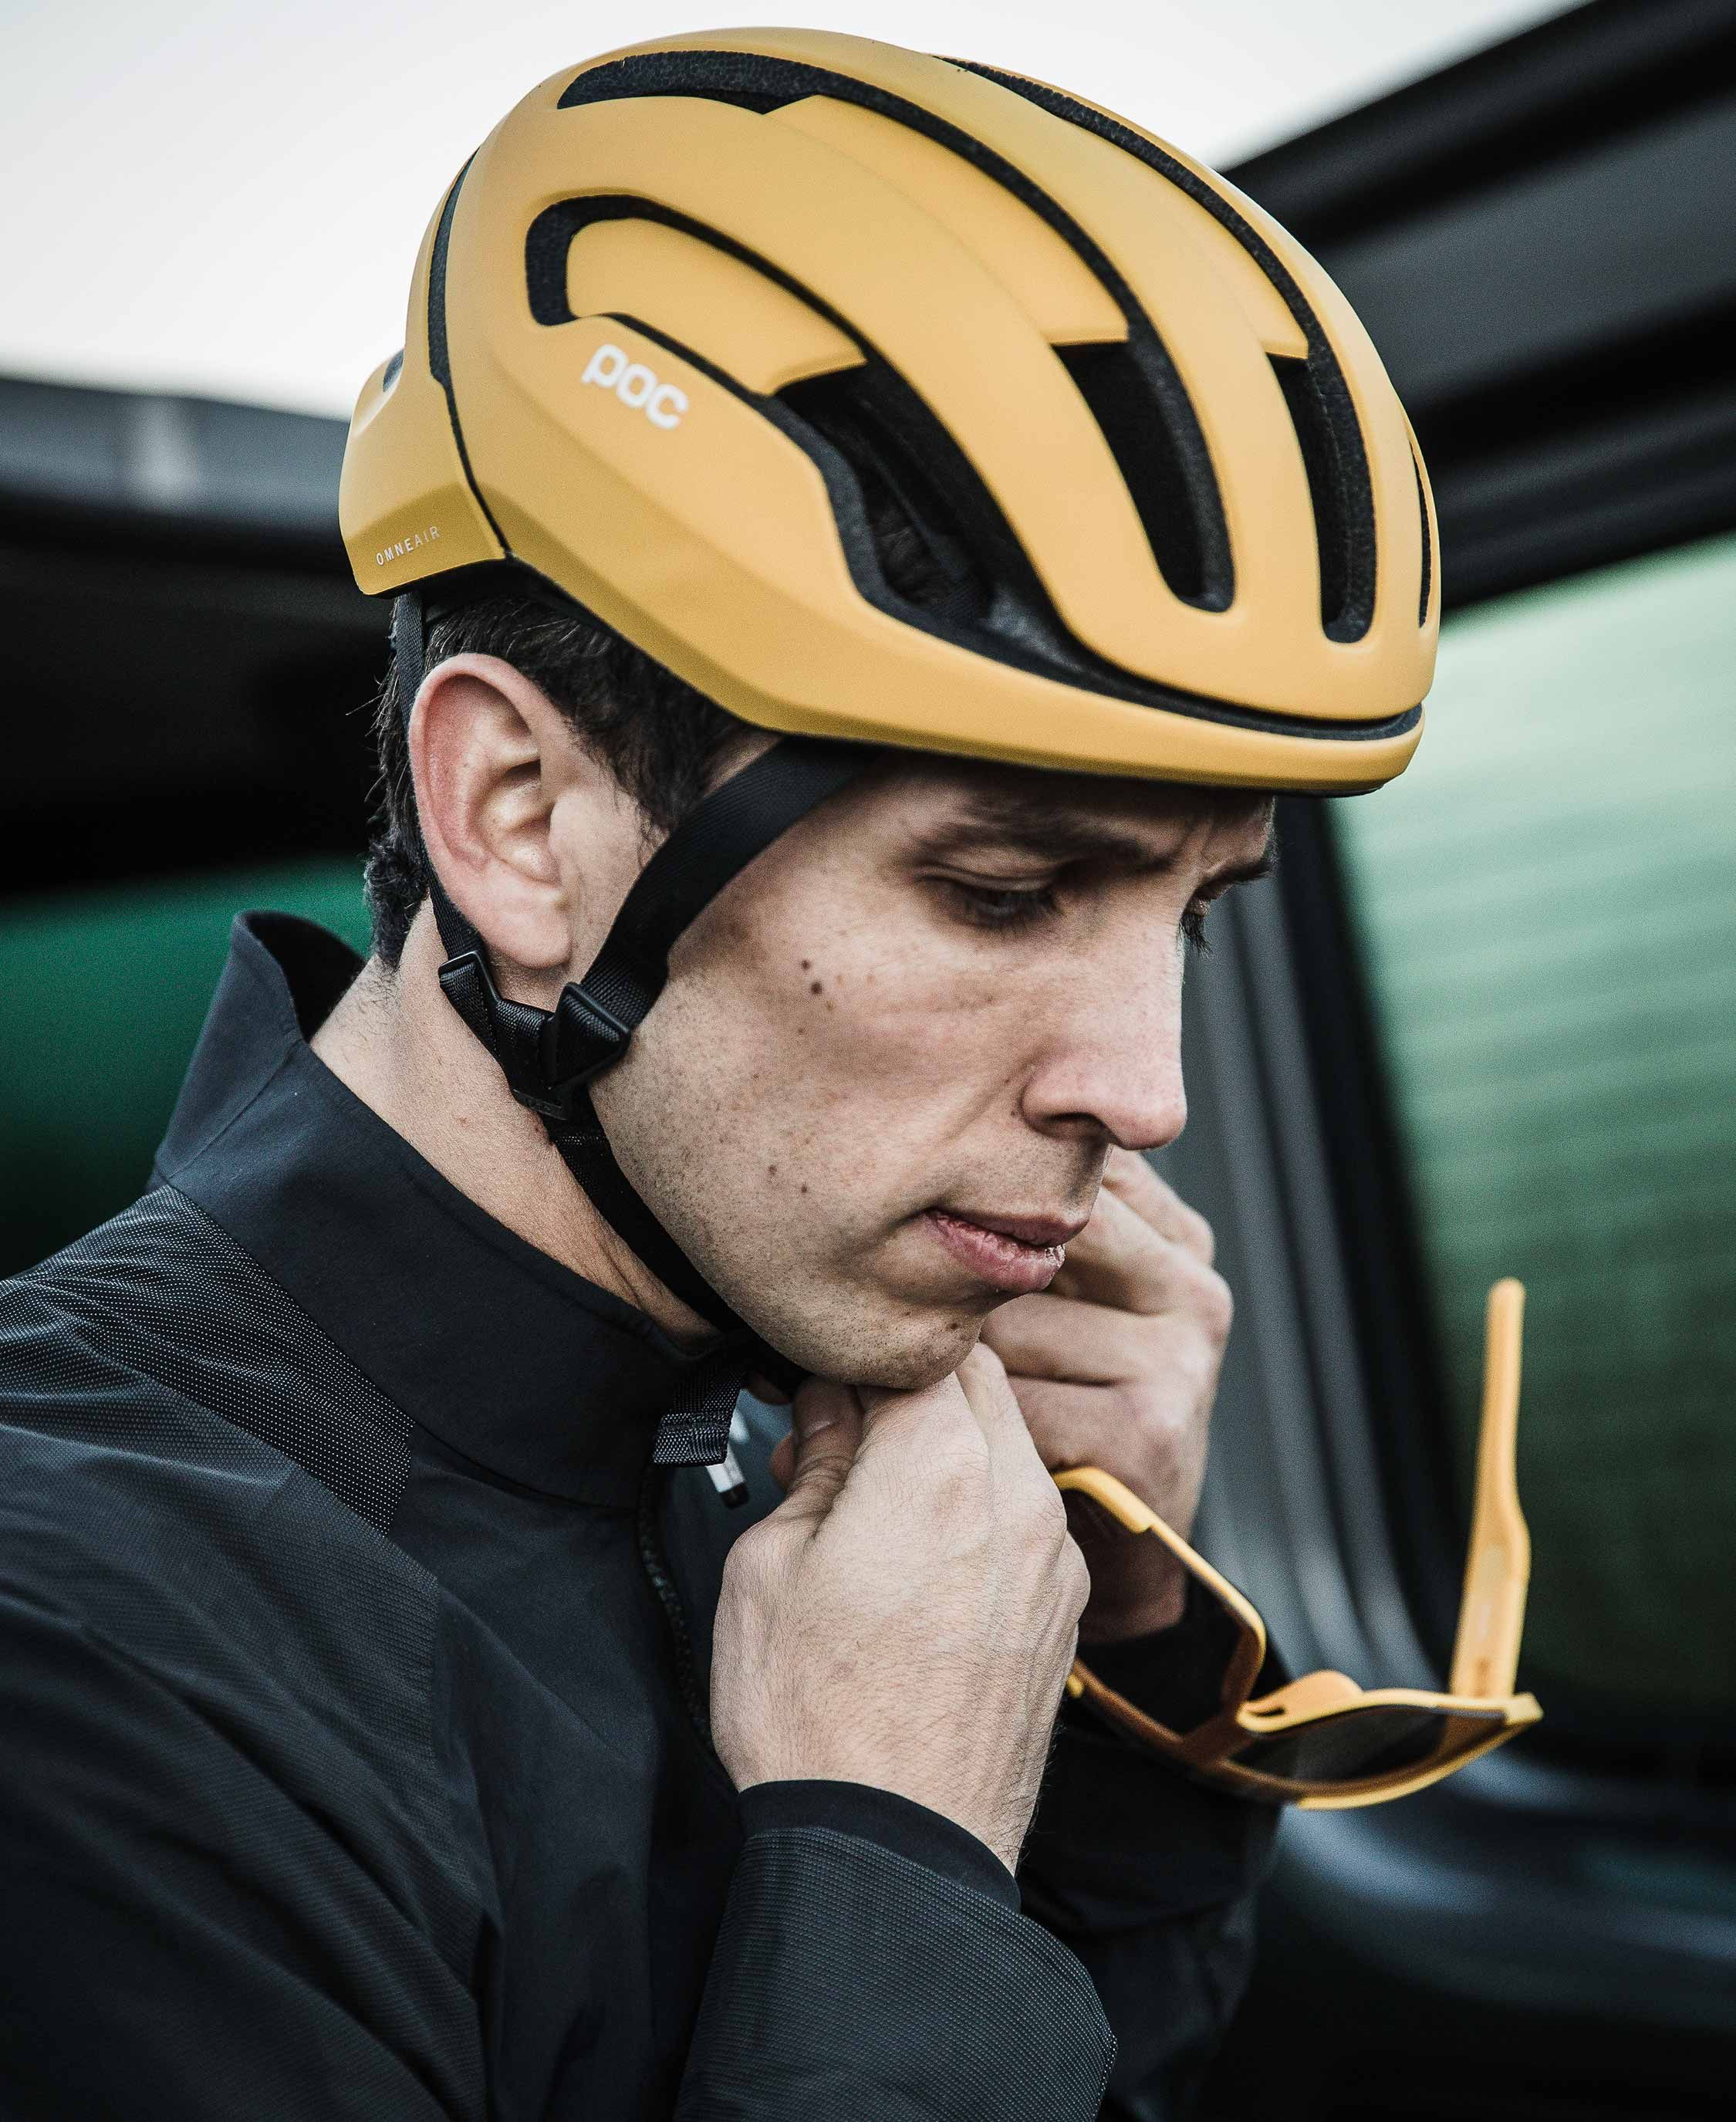 POC Omne Air SPIN Cycling Helmet Cycling helmet